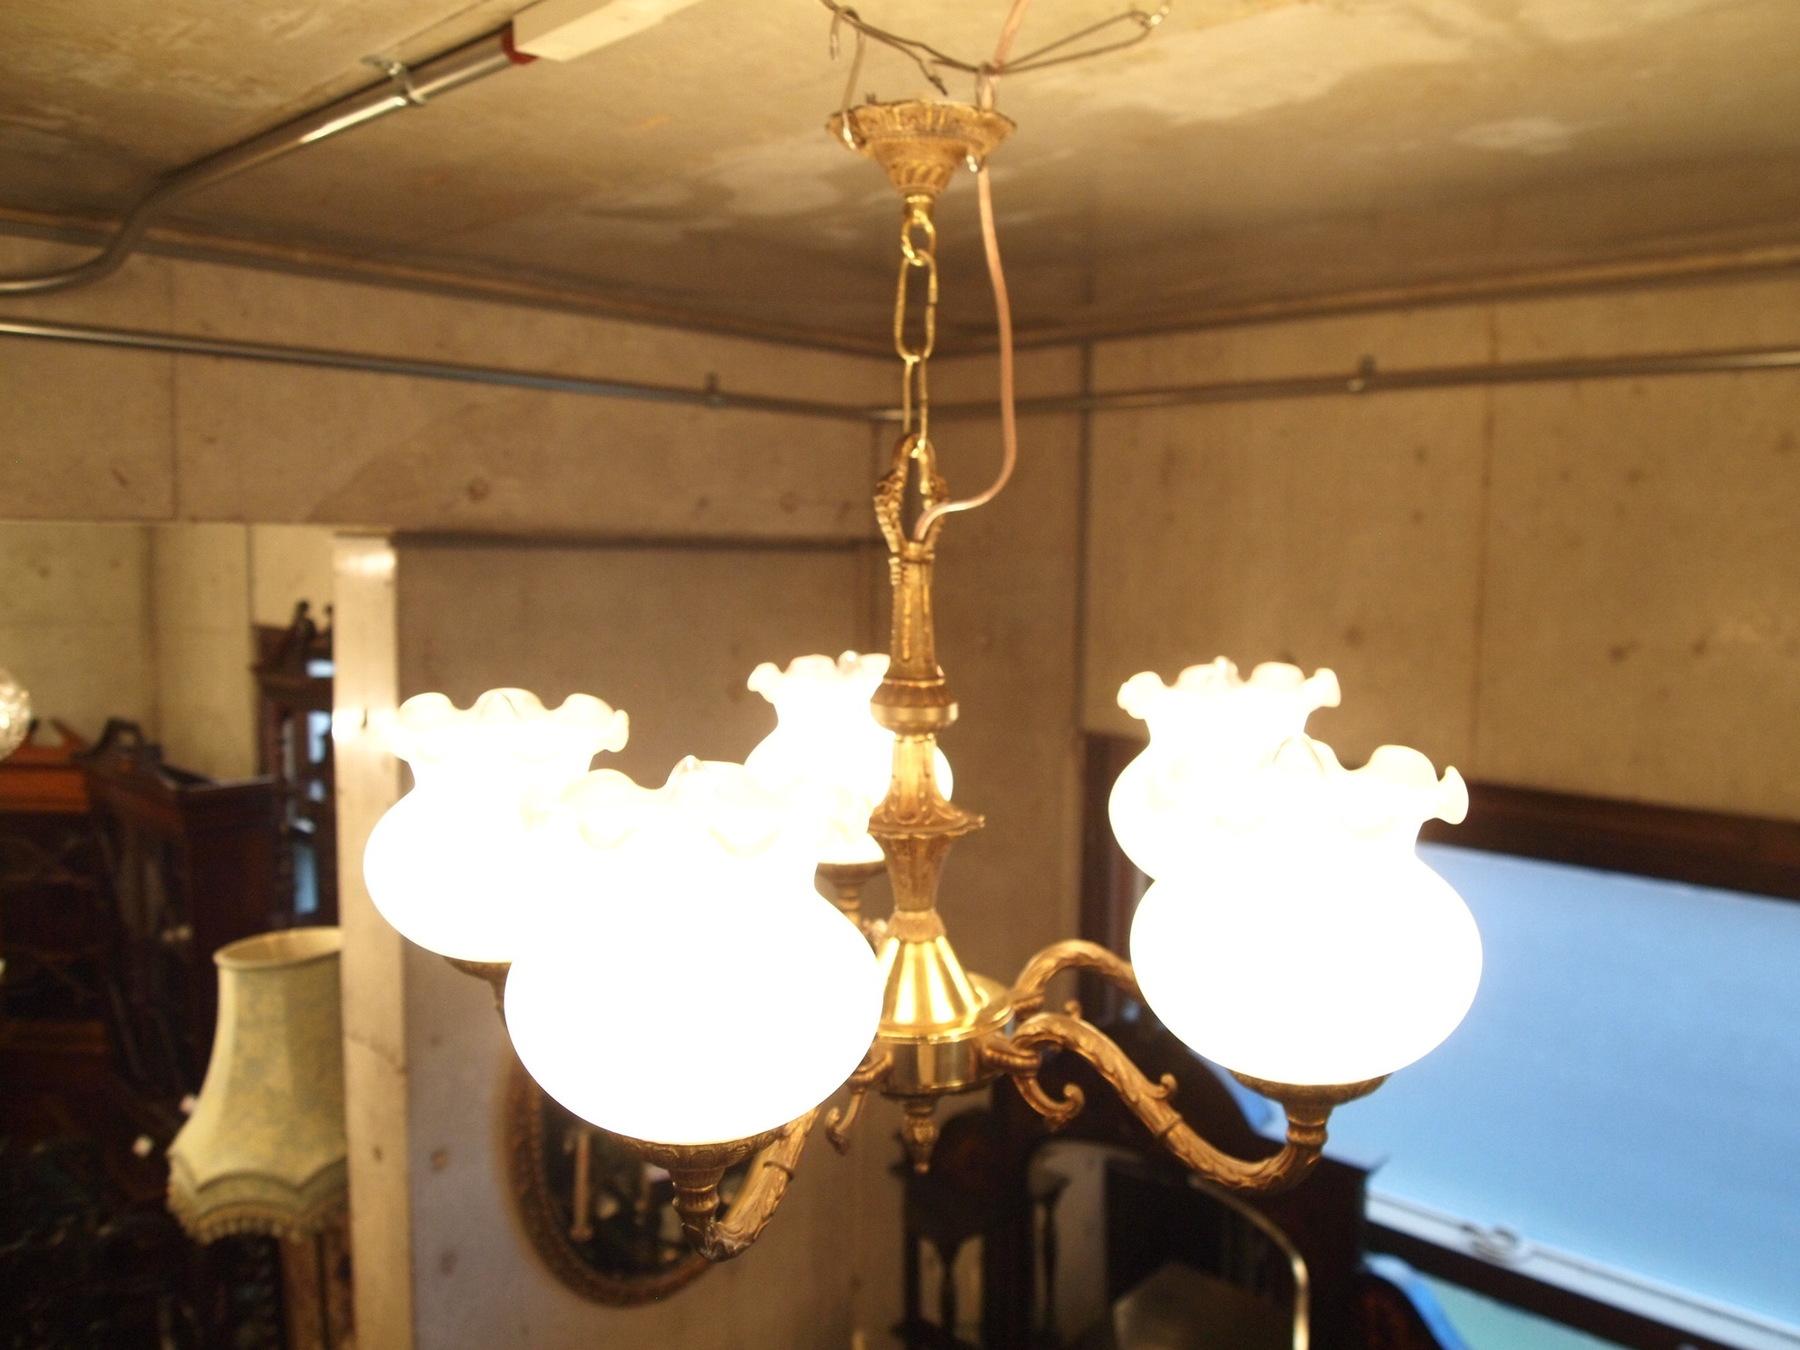 chandelier210409b_01.JPG